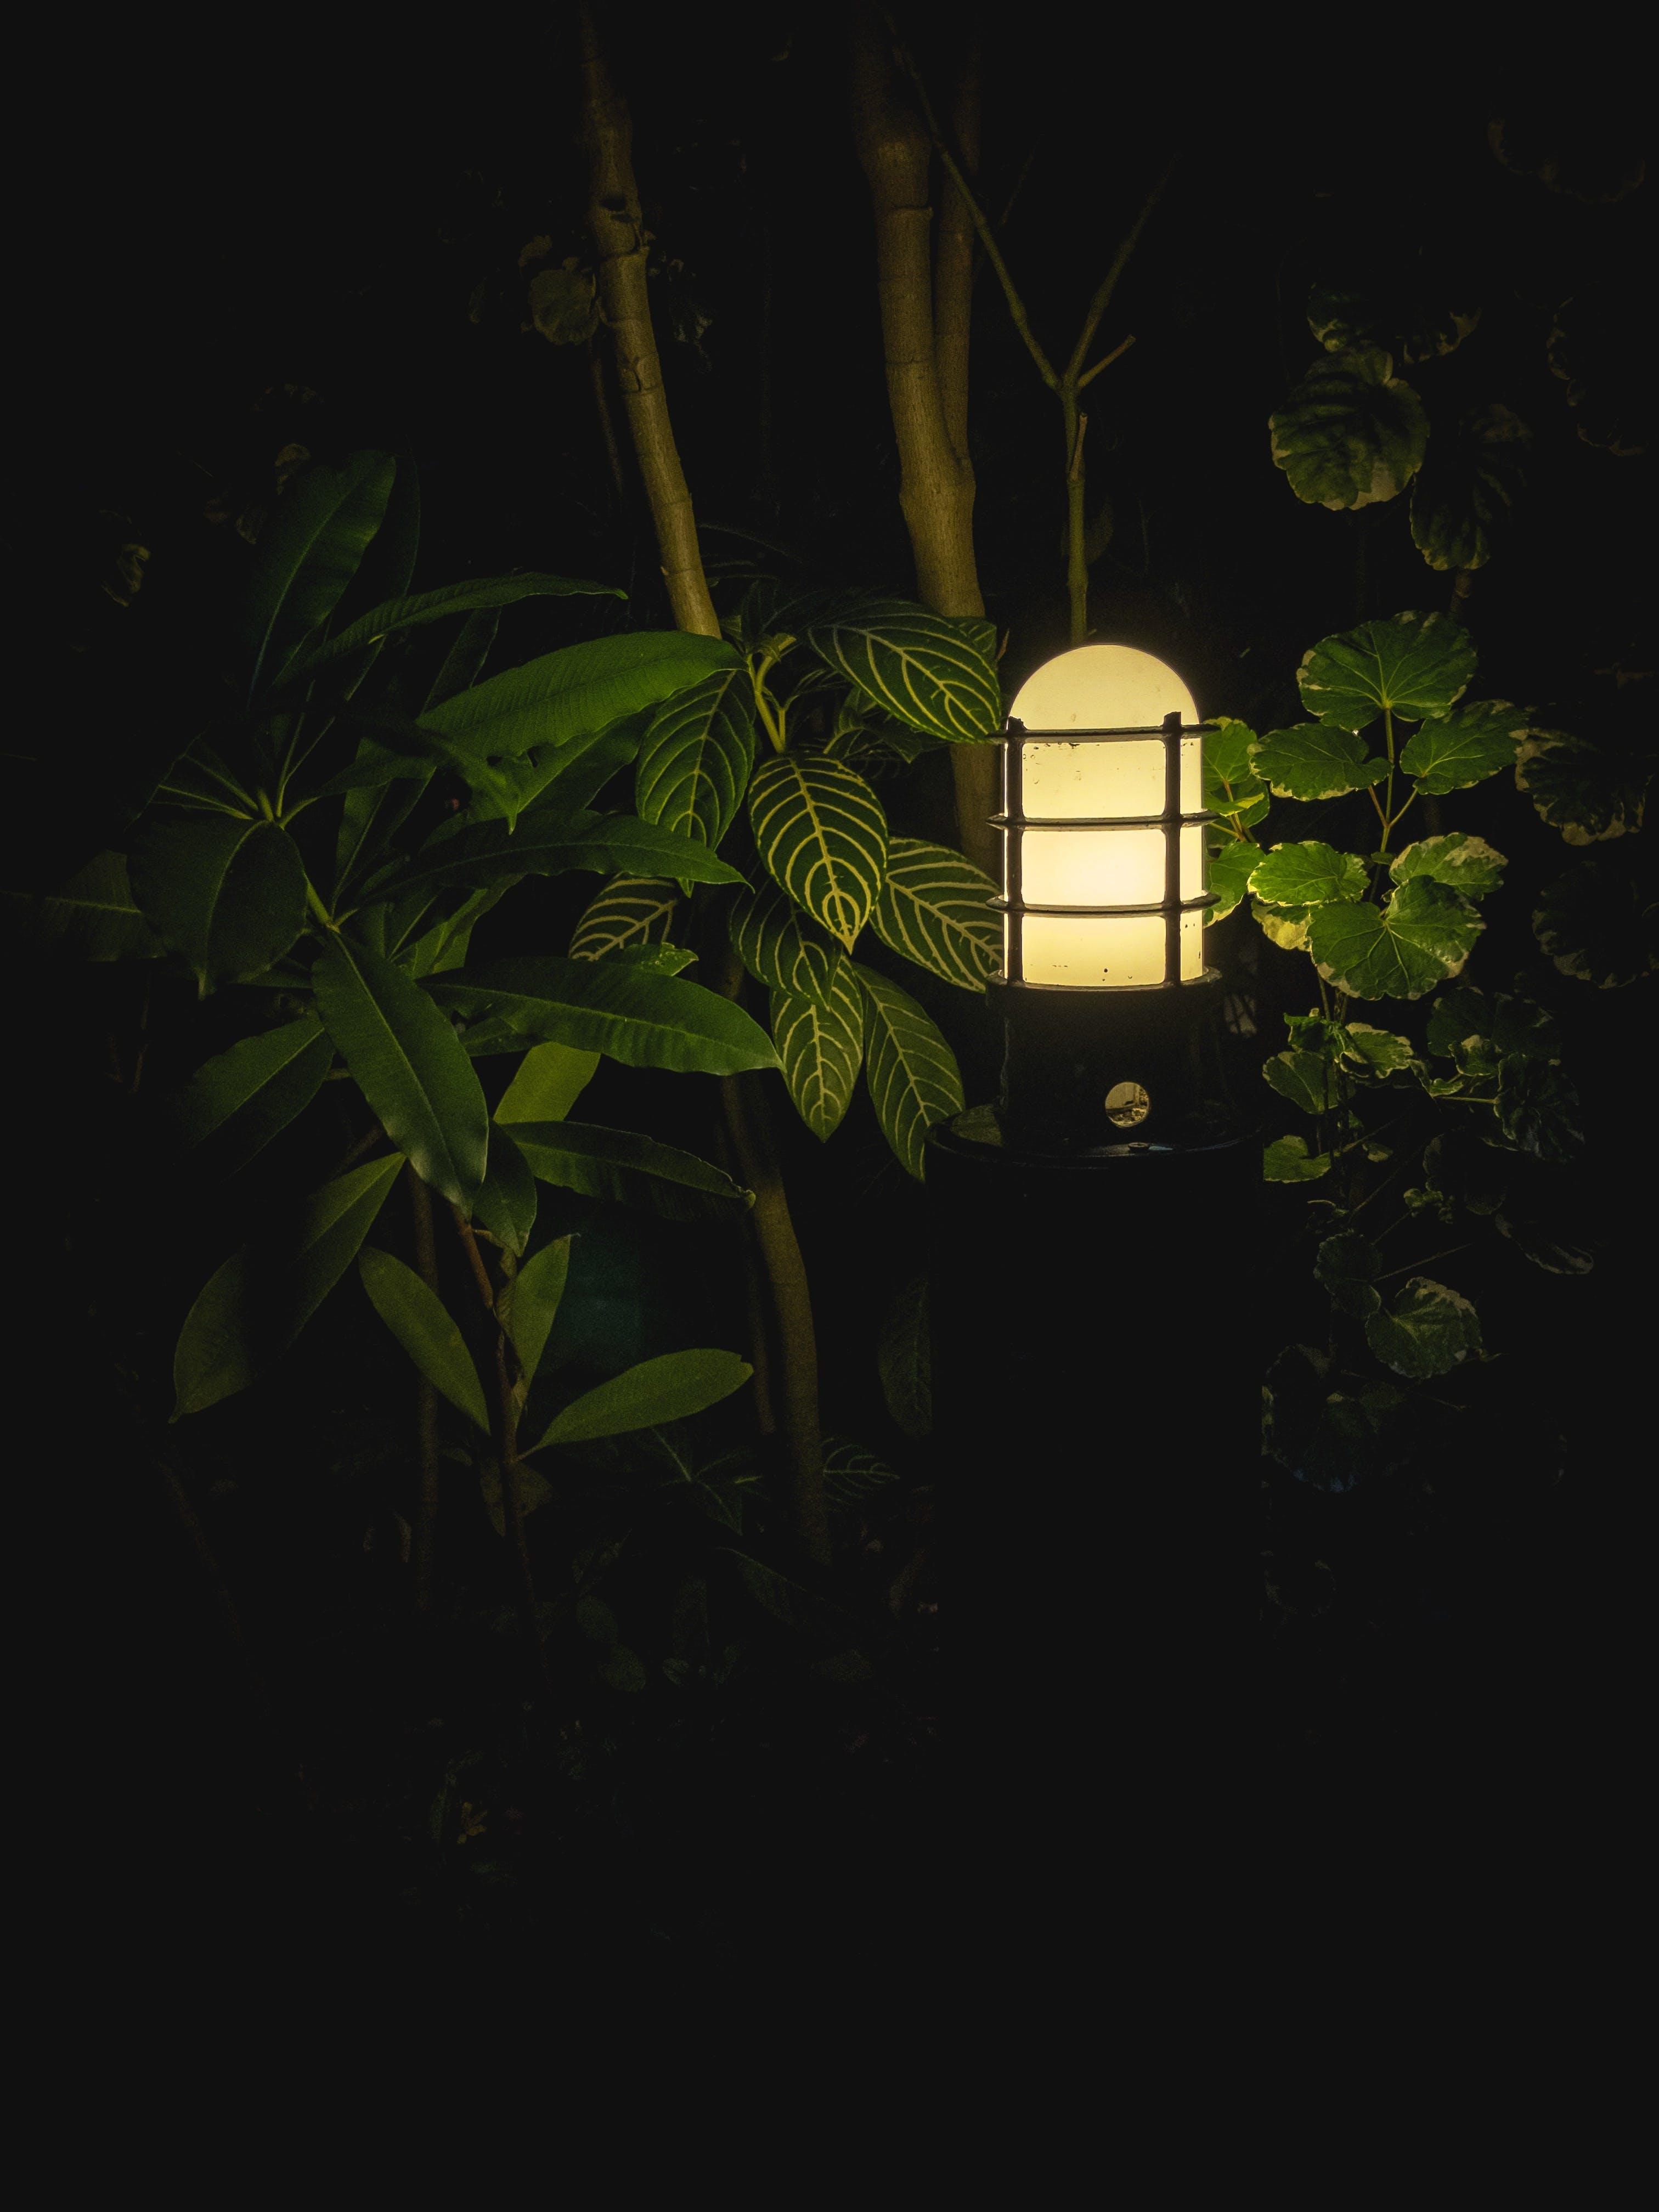 Free stock photo of branches, brightness, contrast, dark